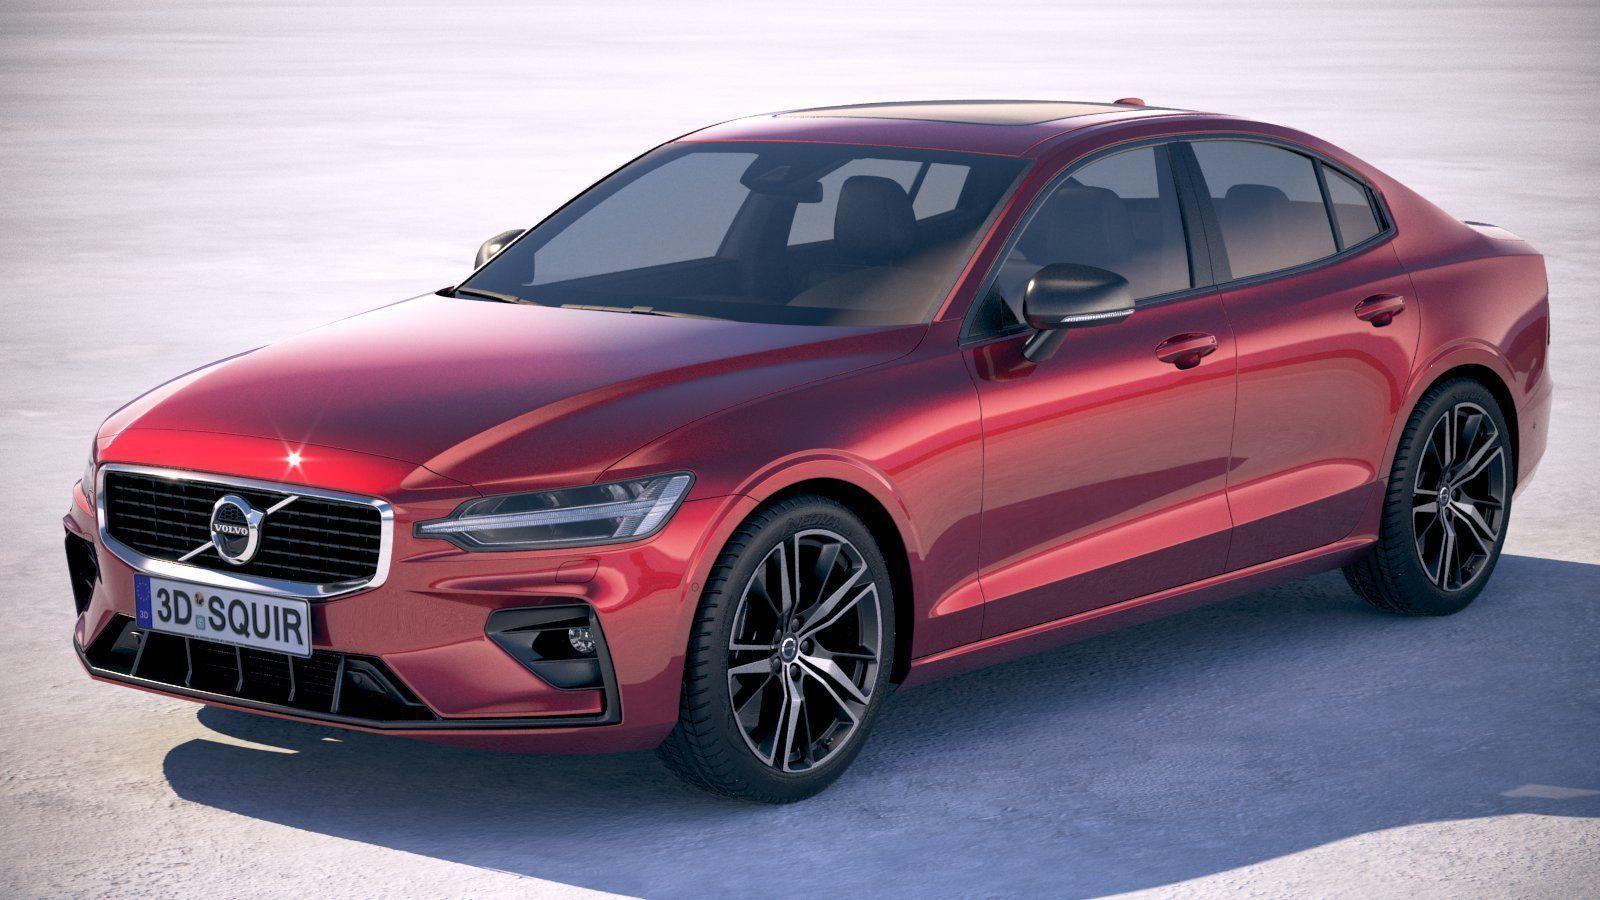 Volvo S60 R-design 2019 3D | CGTrader